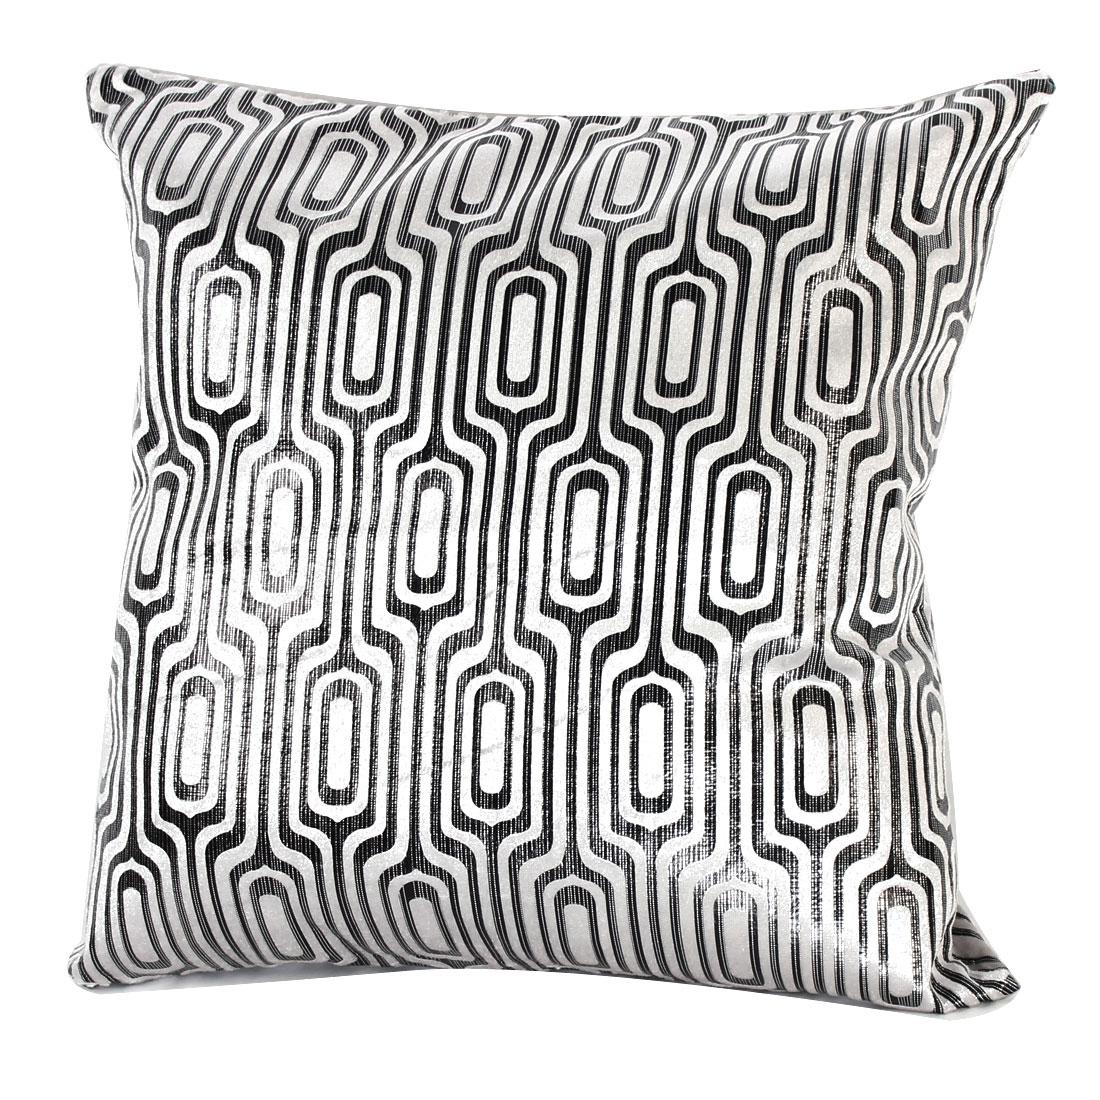 Bedroom Home Hotel Sofa Car Chair Square Decorative Pillowcase Cushion Cover Silver Tone